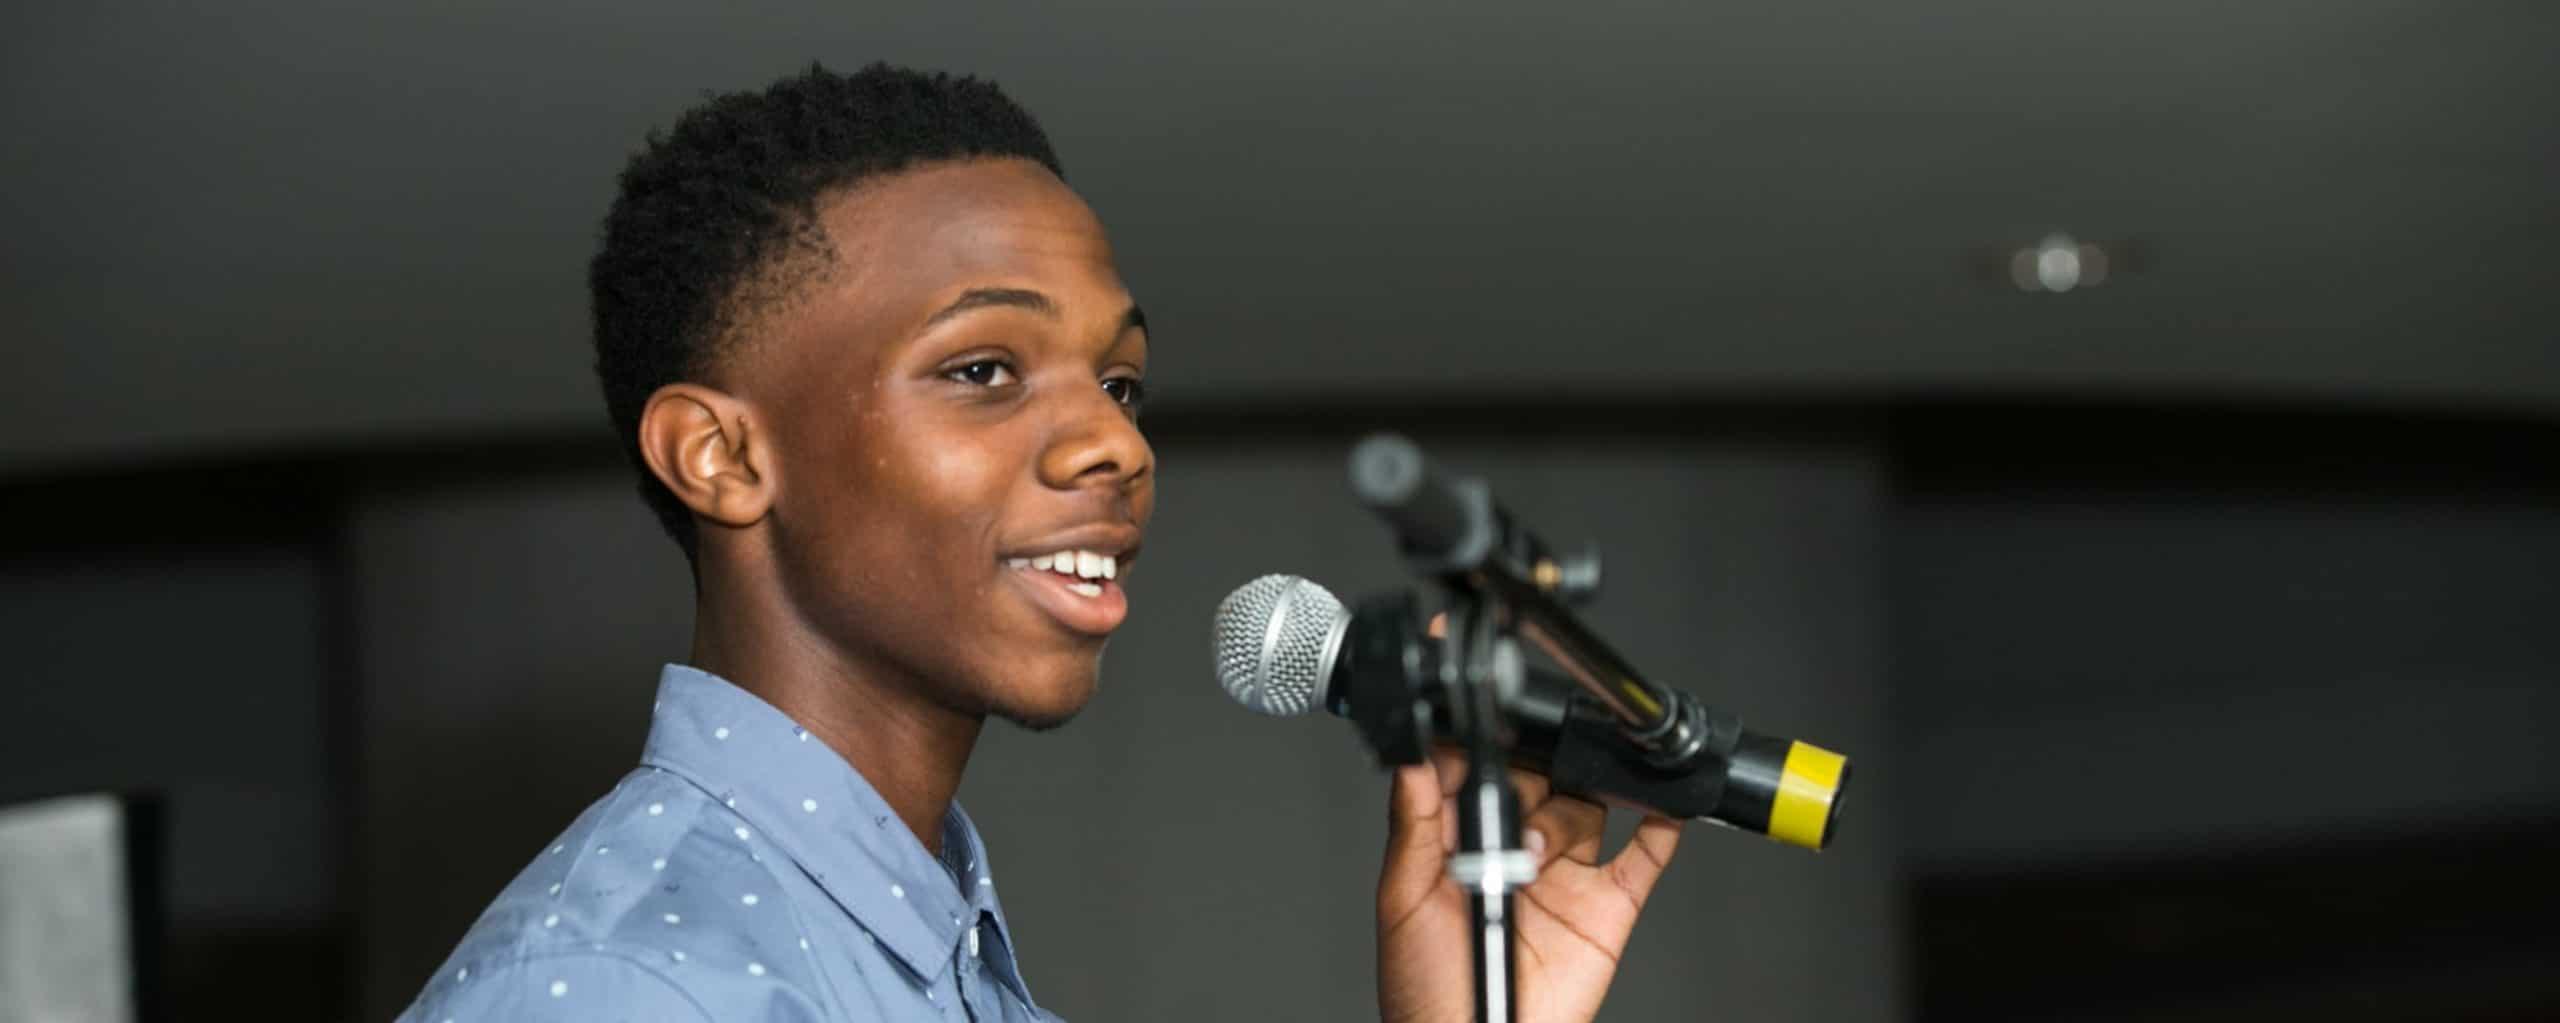 boy using microphone